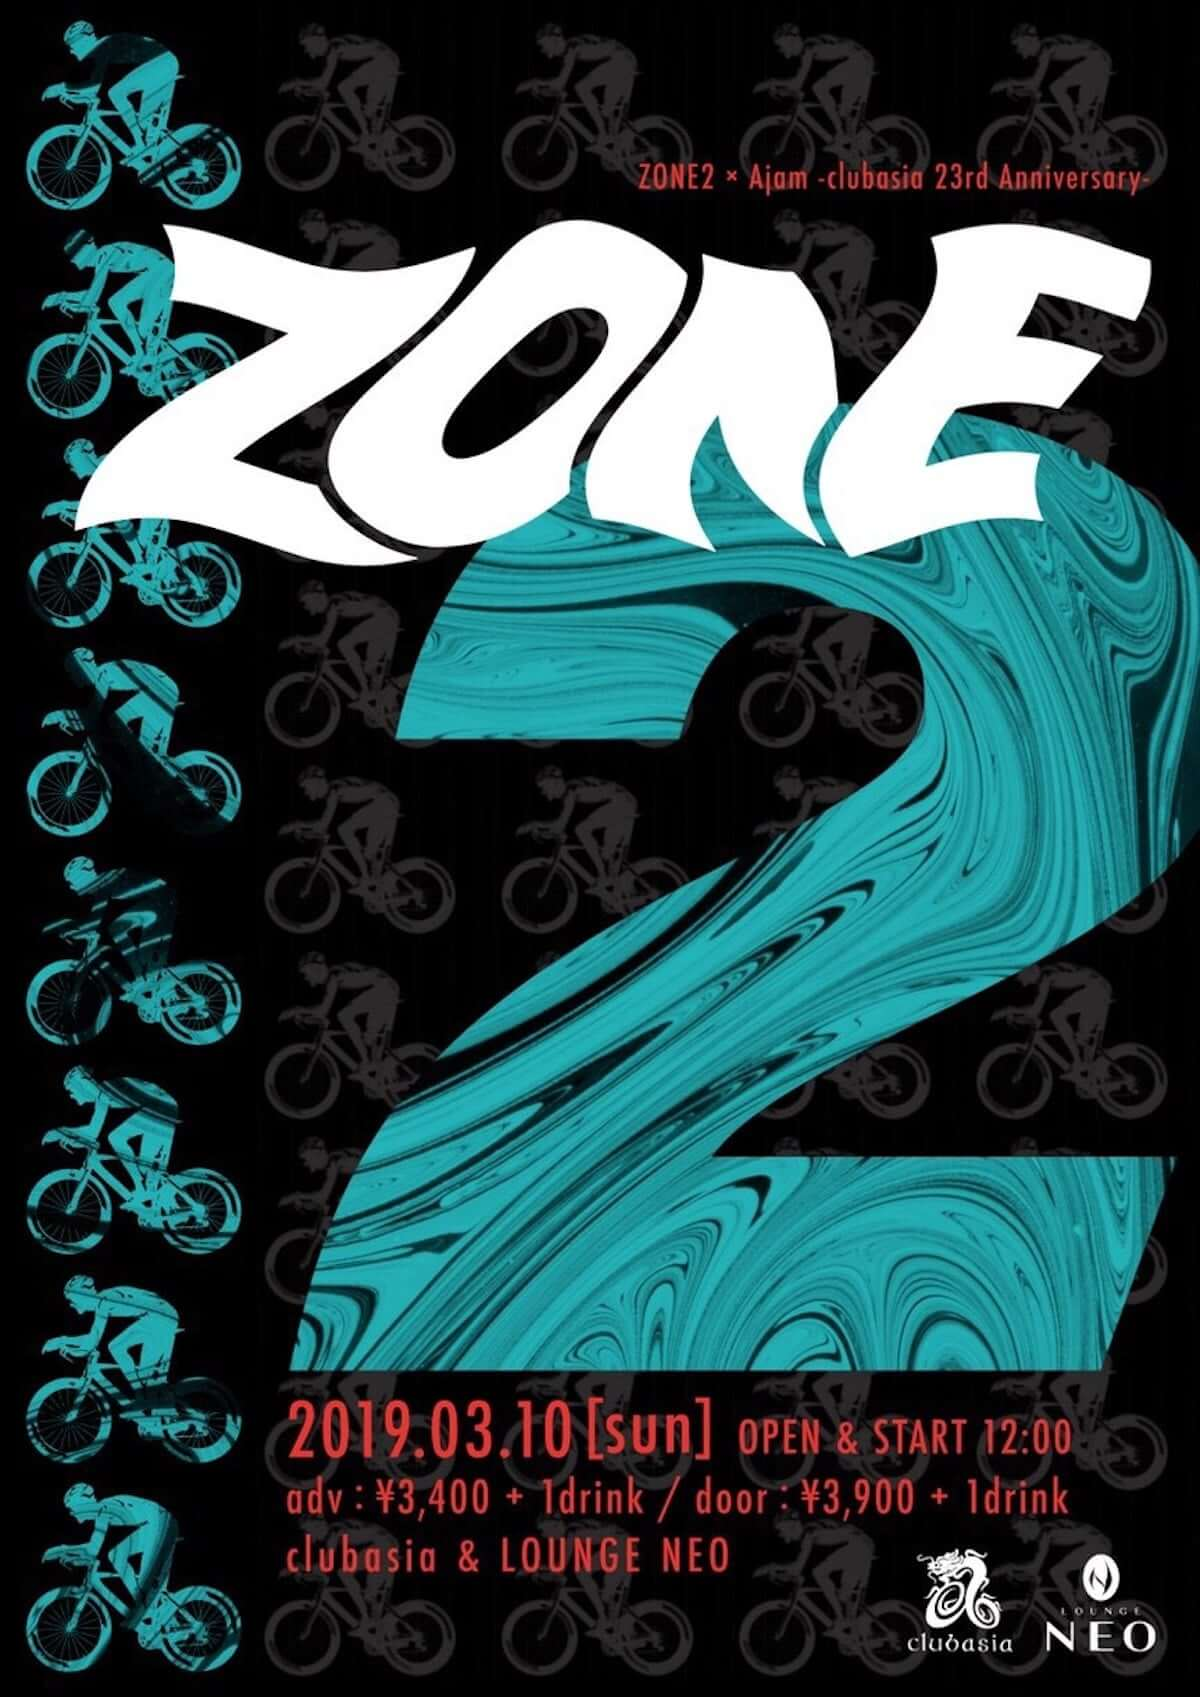 『ZONE2』追加ラインナップ発表|トリプルファイヤー、LITTLE DEAD GIRL(tokyovitamin)他3組追加 zone1-1200x1697